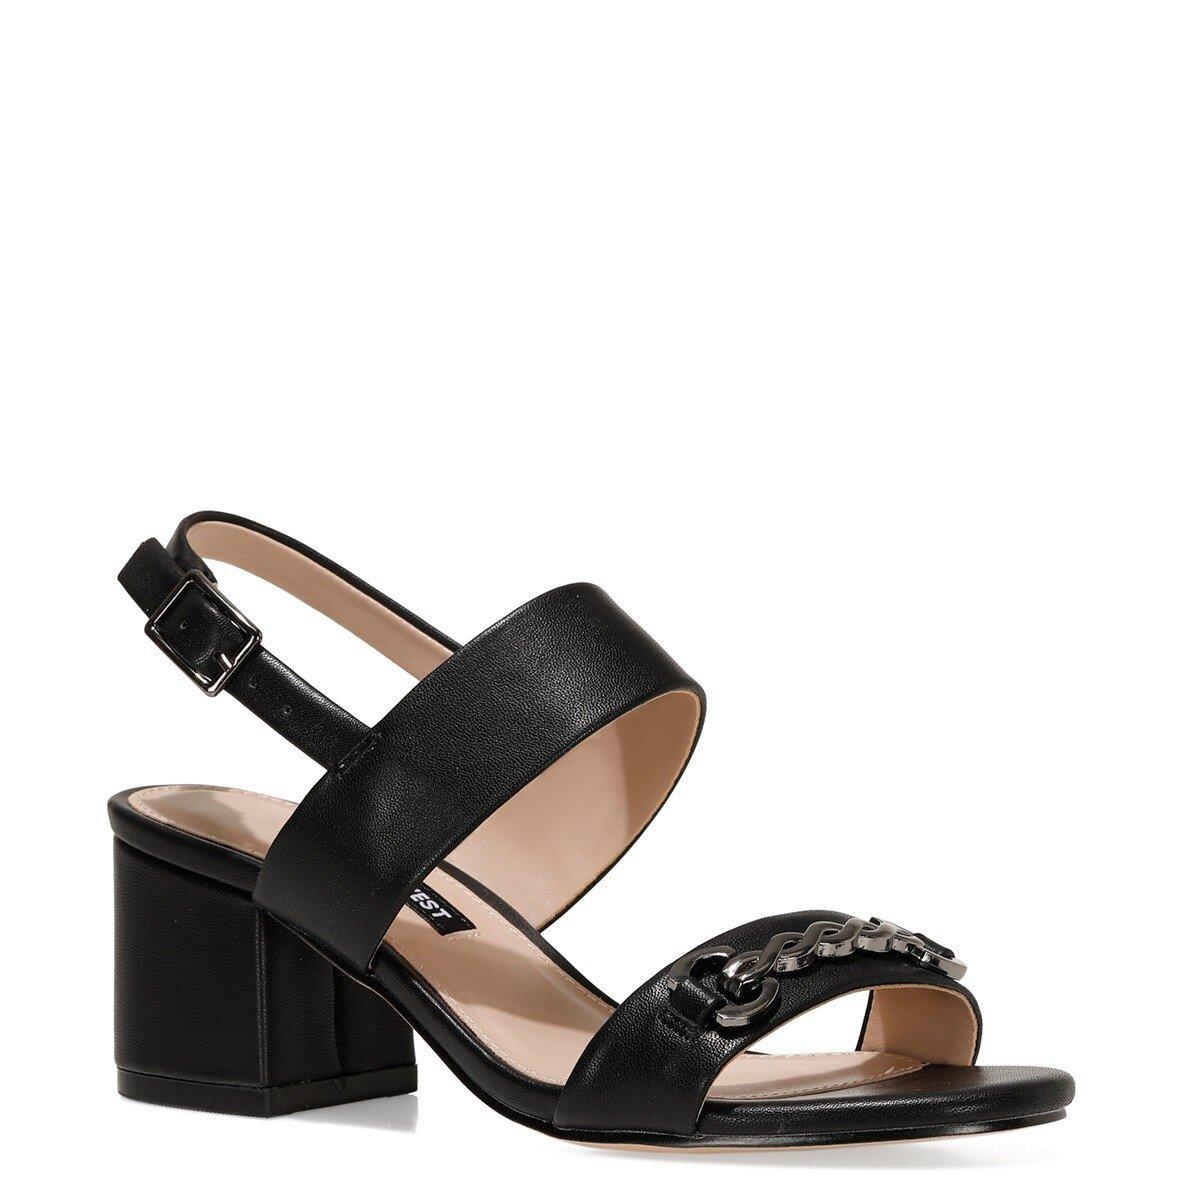 SAMARA 1FX Siyah Kadın Topuklu Sandalet